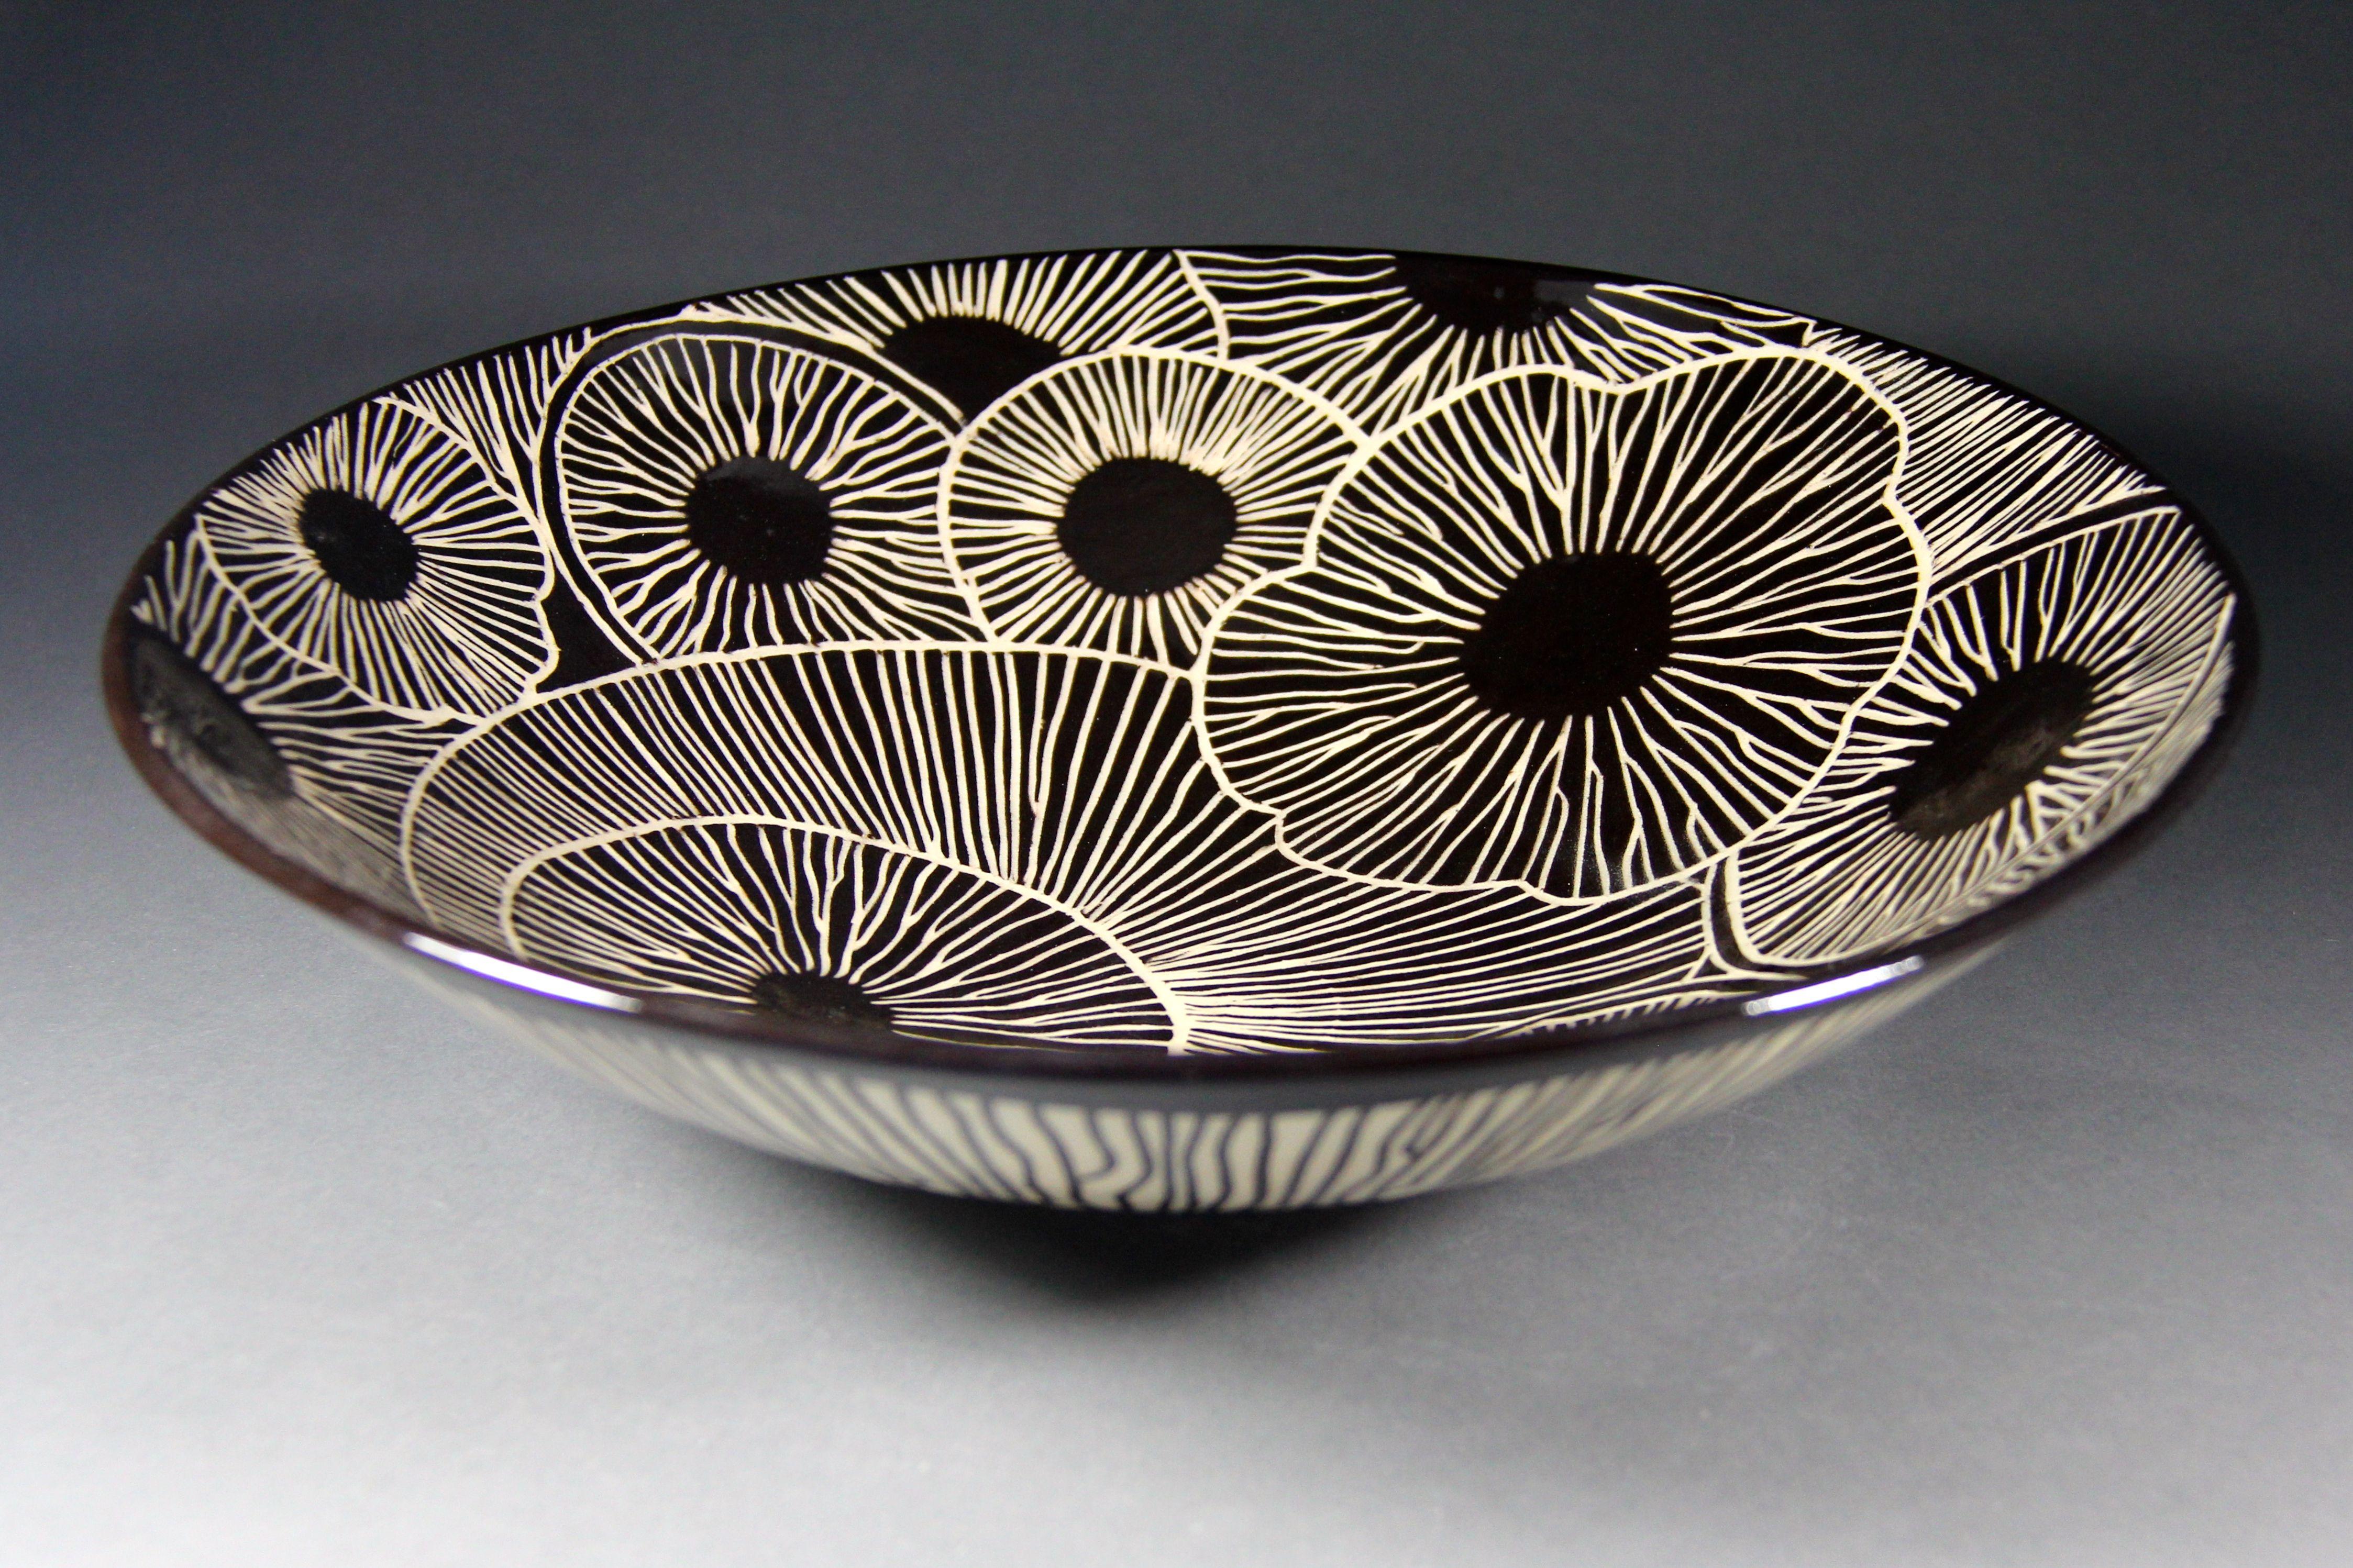 Marise Fransolino Sgraffito Bowl Velvet Underglaze Sgraffito With Hf 9 Zinc Free Clear Sgraffito Pottery Ceramic Pottery